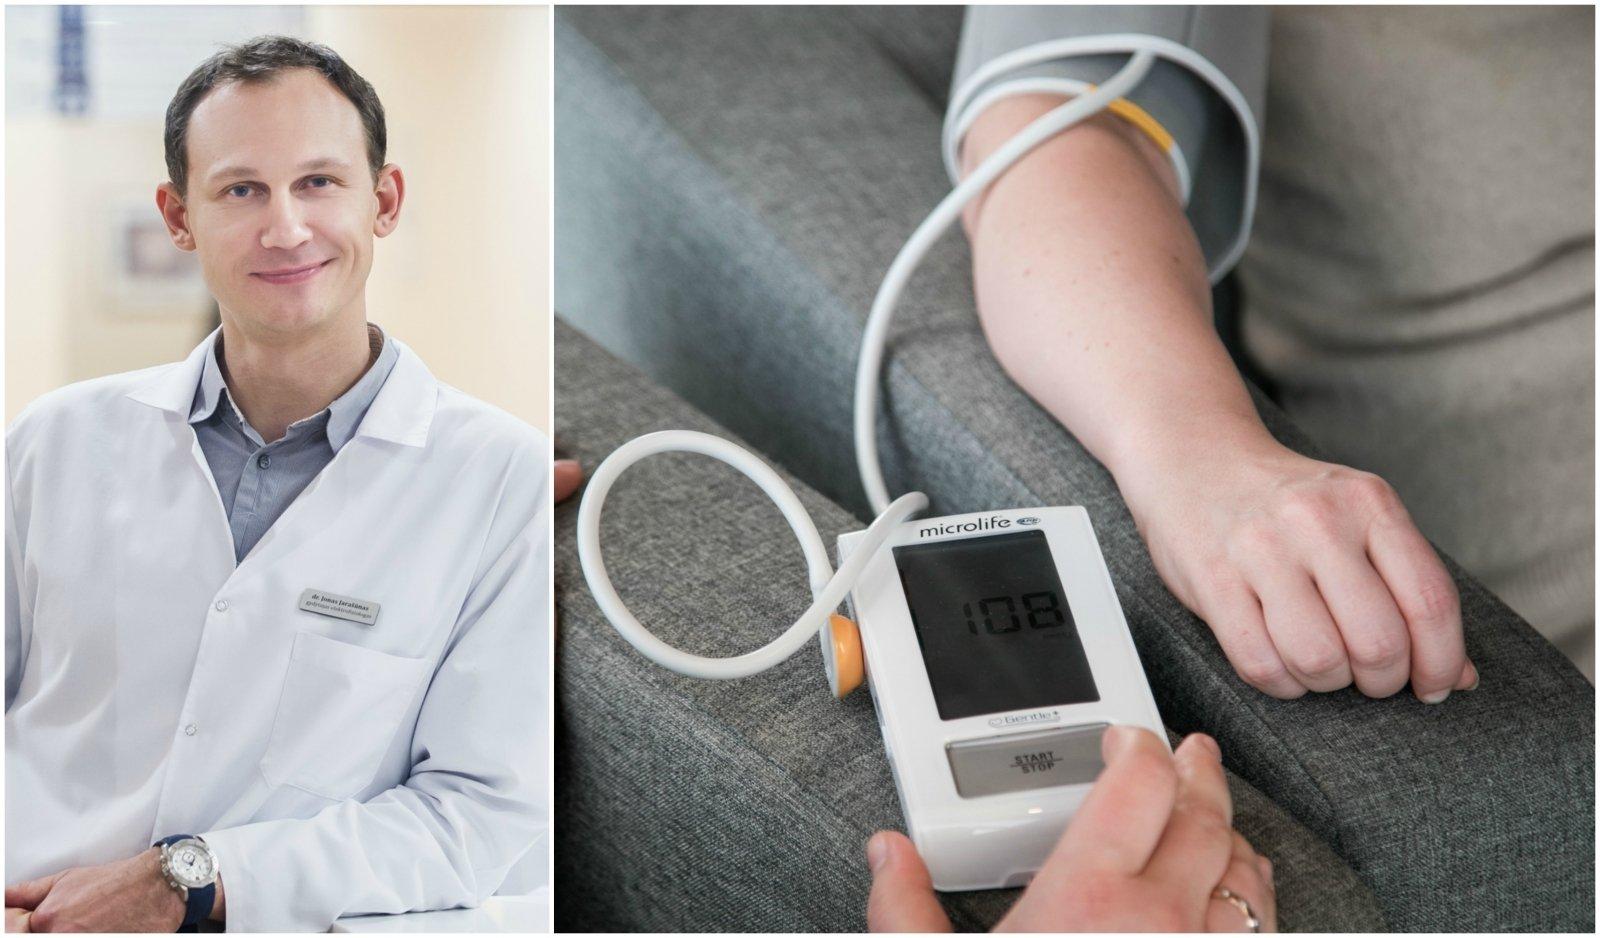 straipsnio hipertenzija nėra liga